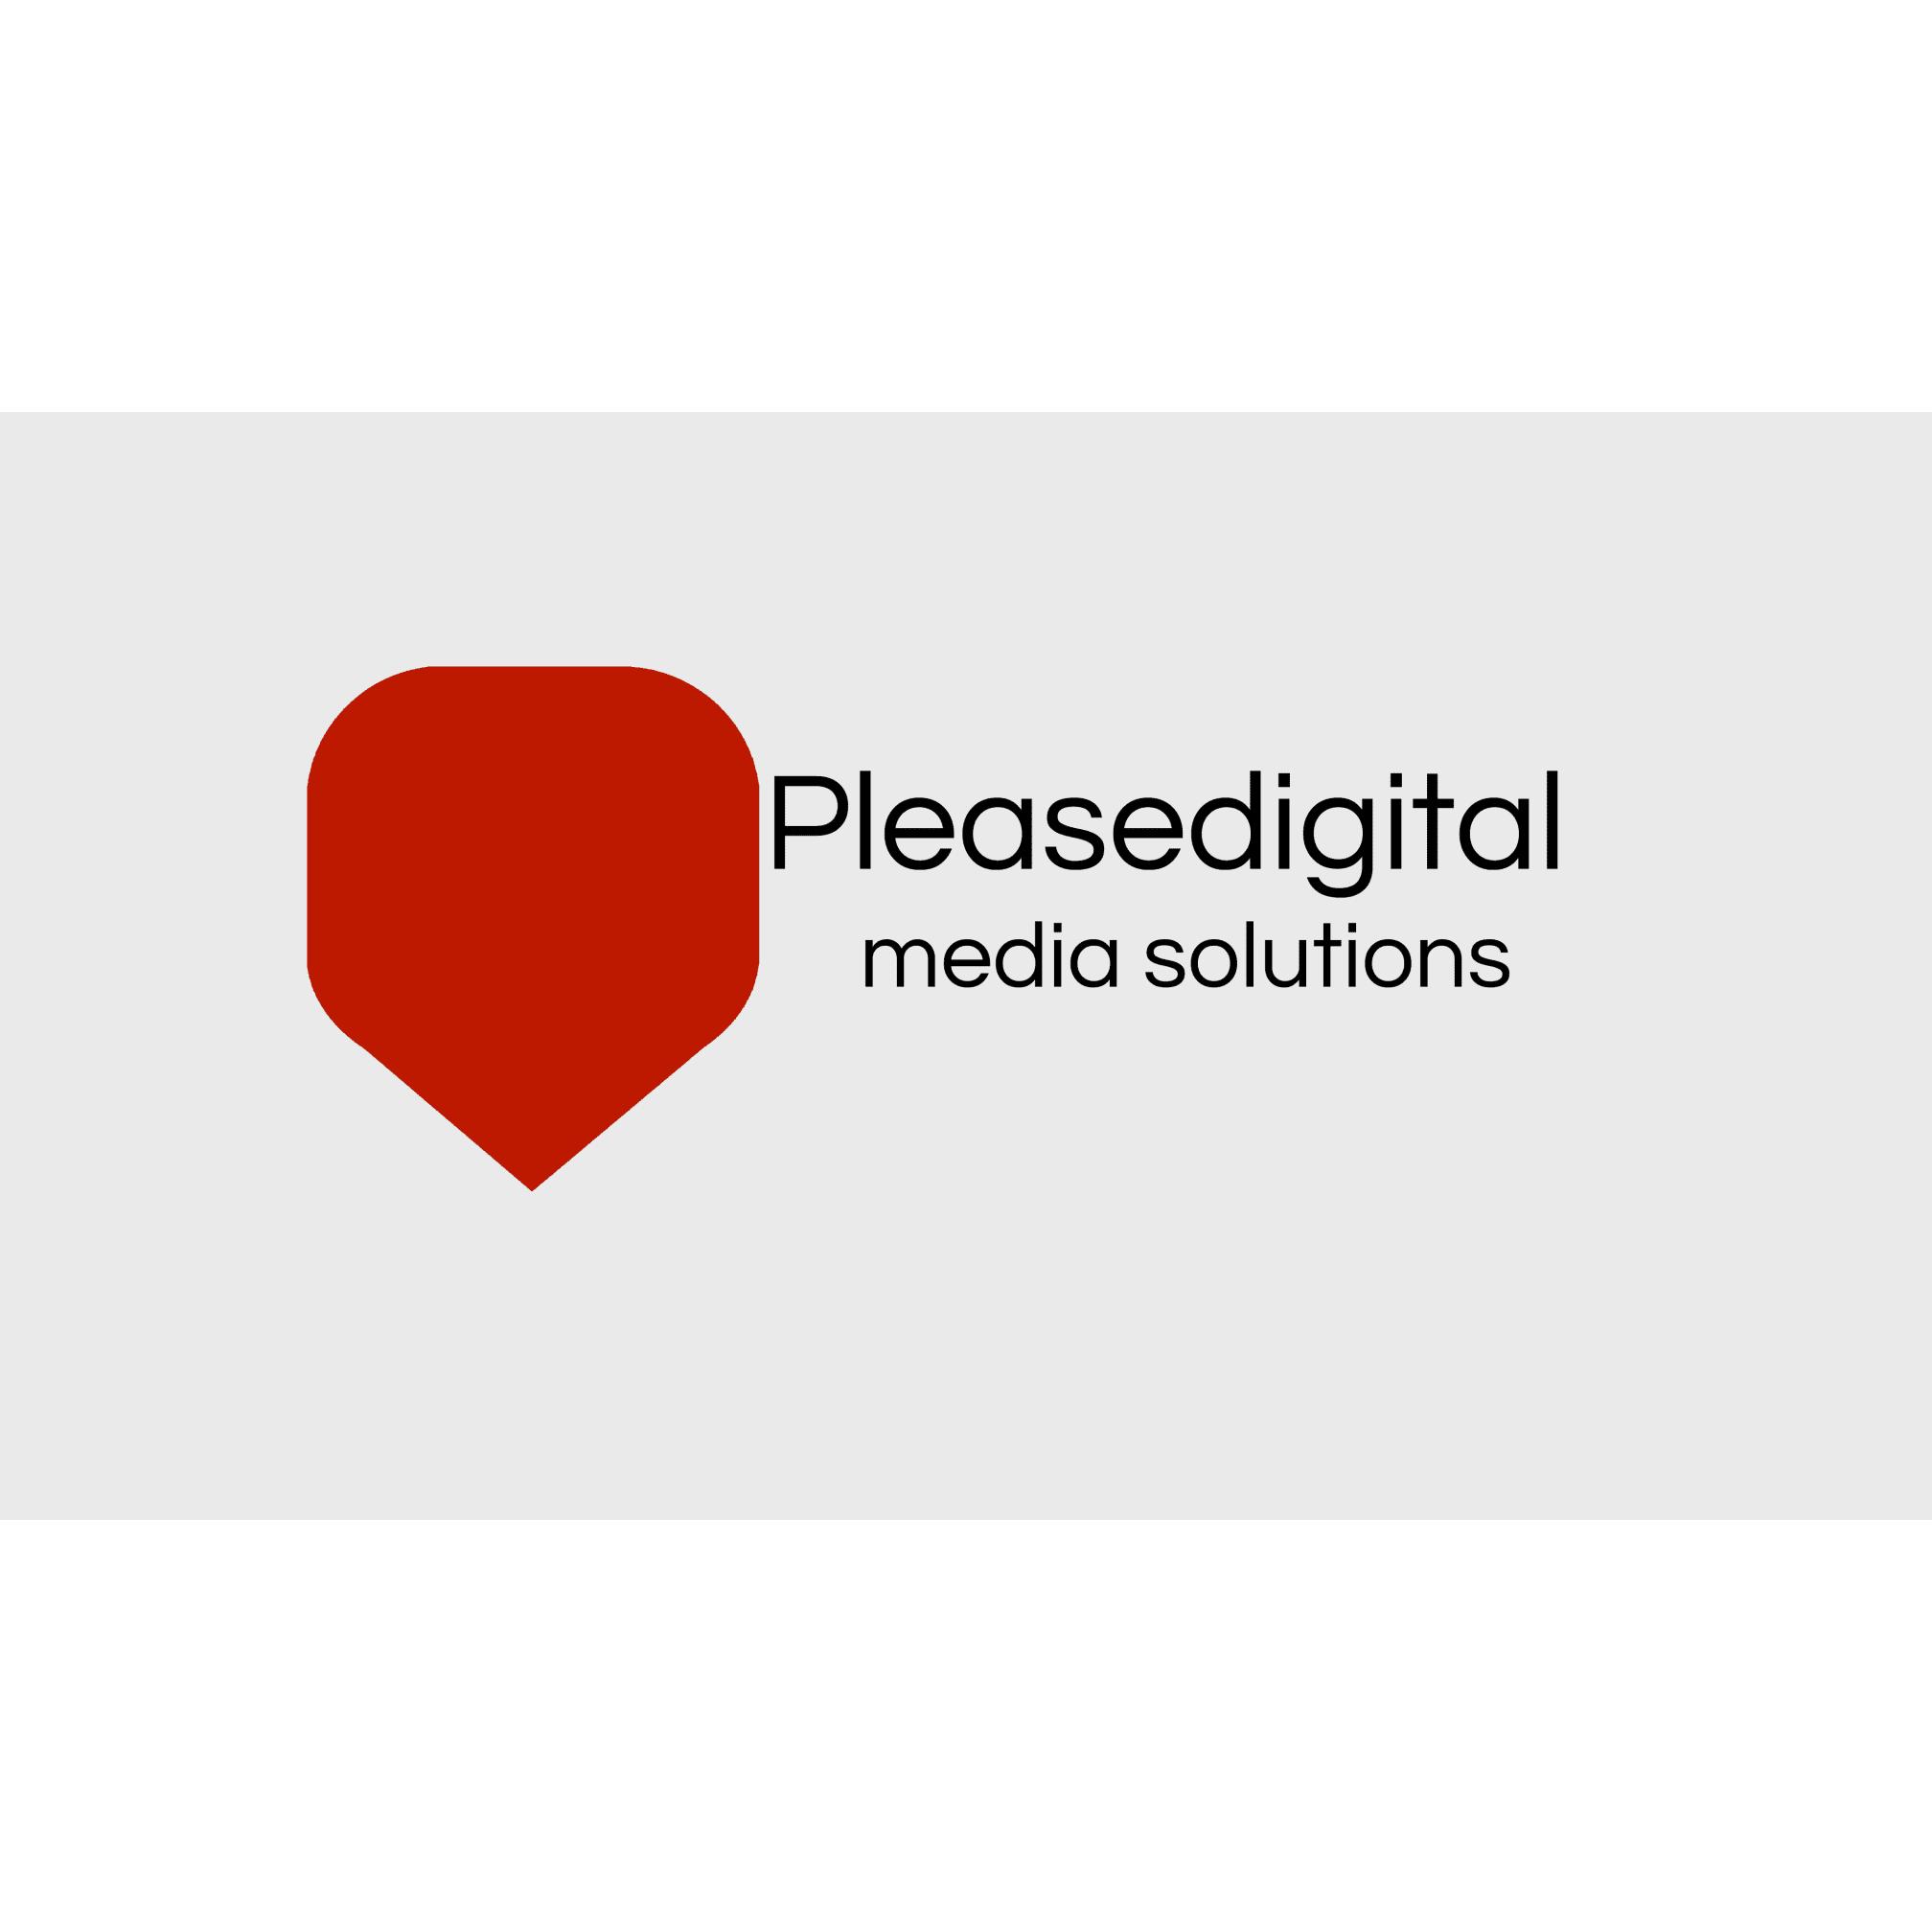 Pleasedigital Media Solutions - Peterborough, Cambridgeshire PE2 7JE - 01733 301984 | ShowMeLocal.com